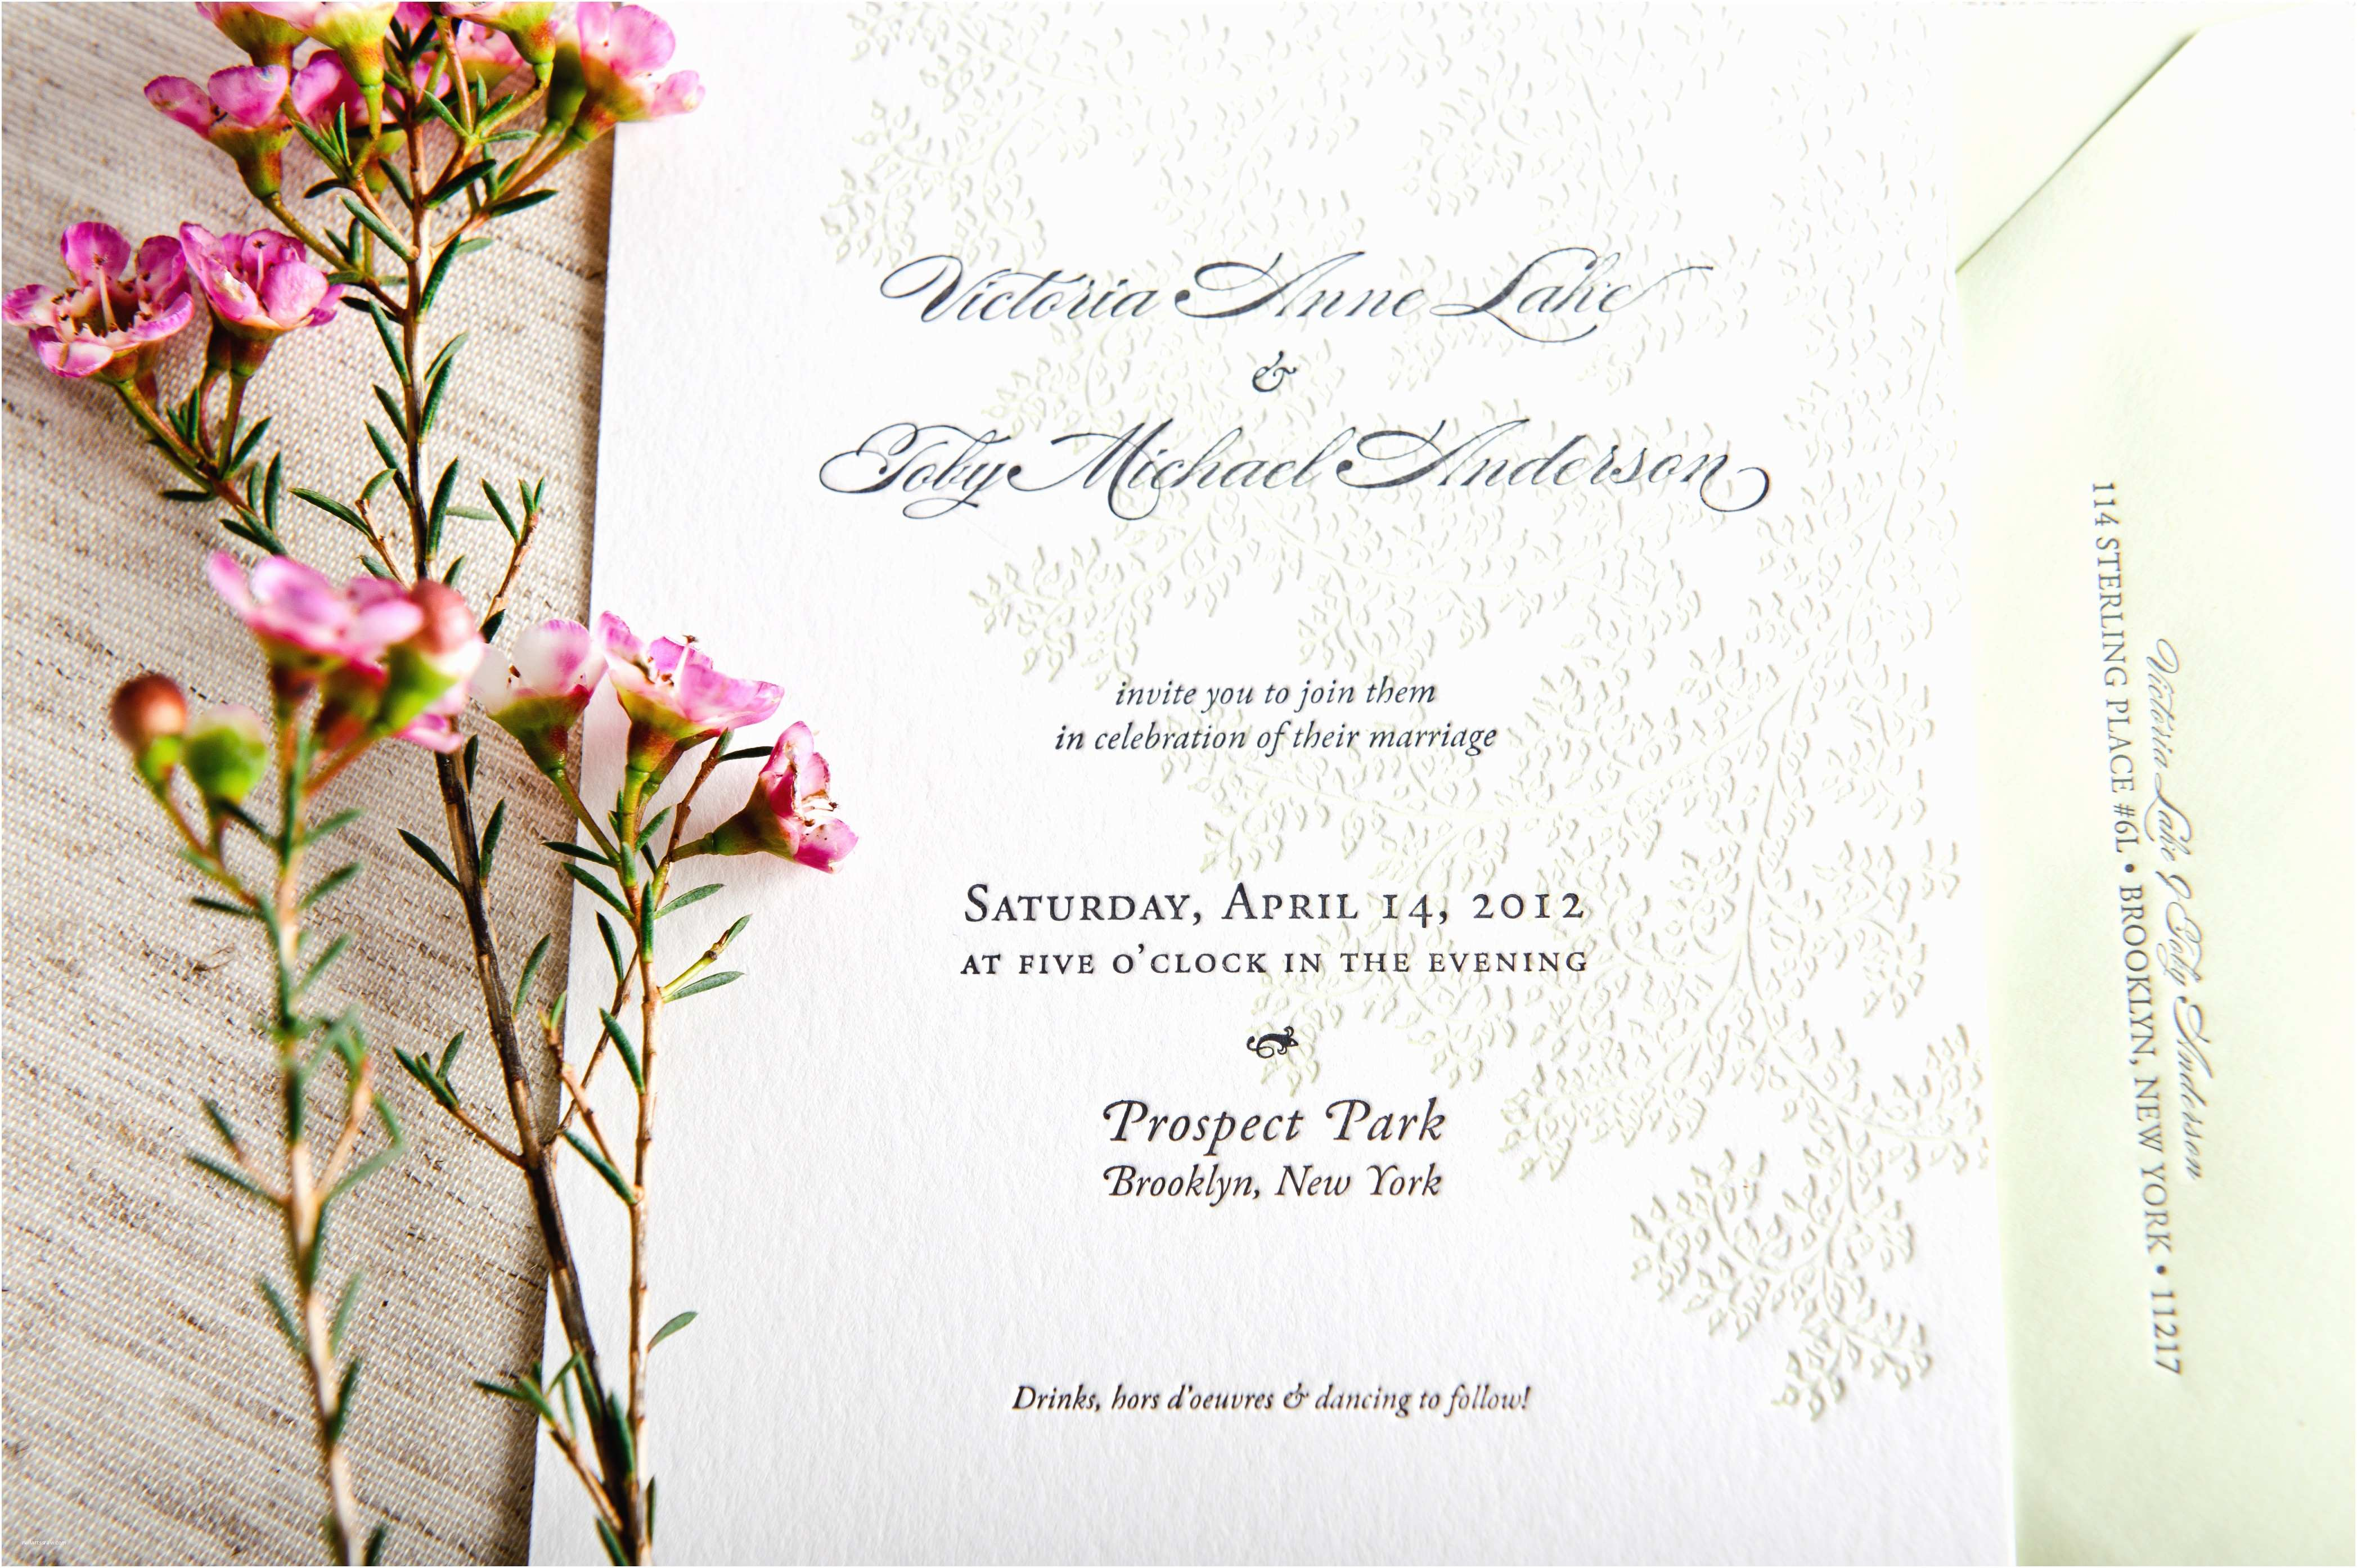 Wedding Invitation Images Wedding Invitation Wording Wedding Invitation Templates